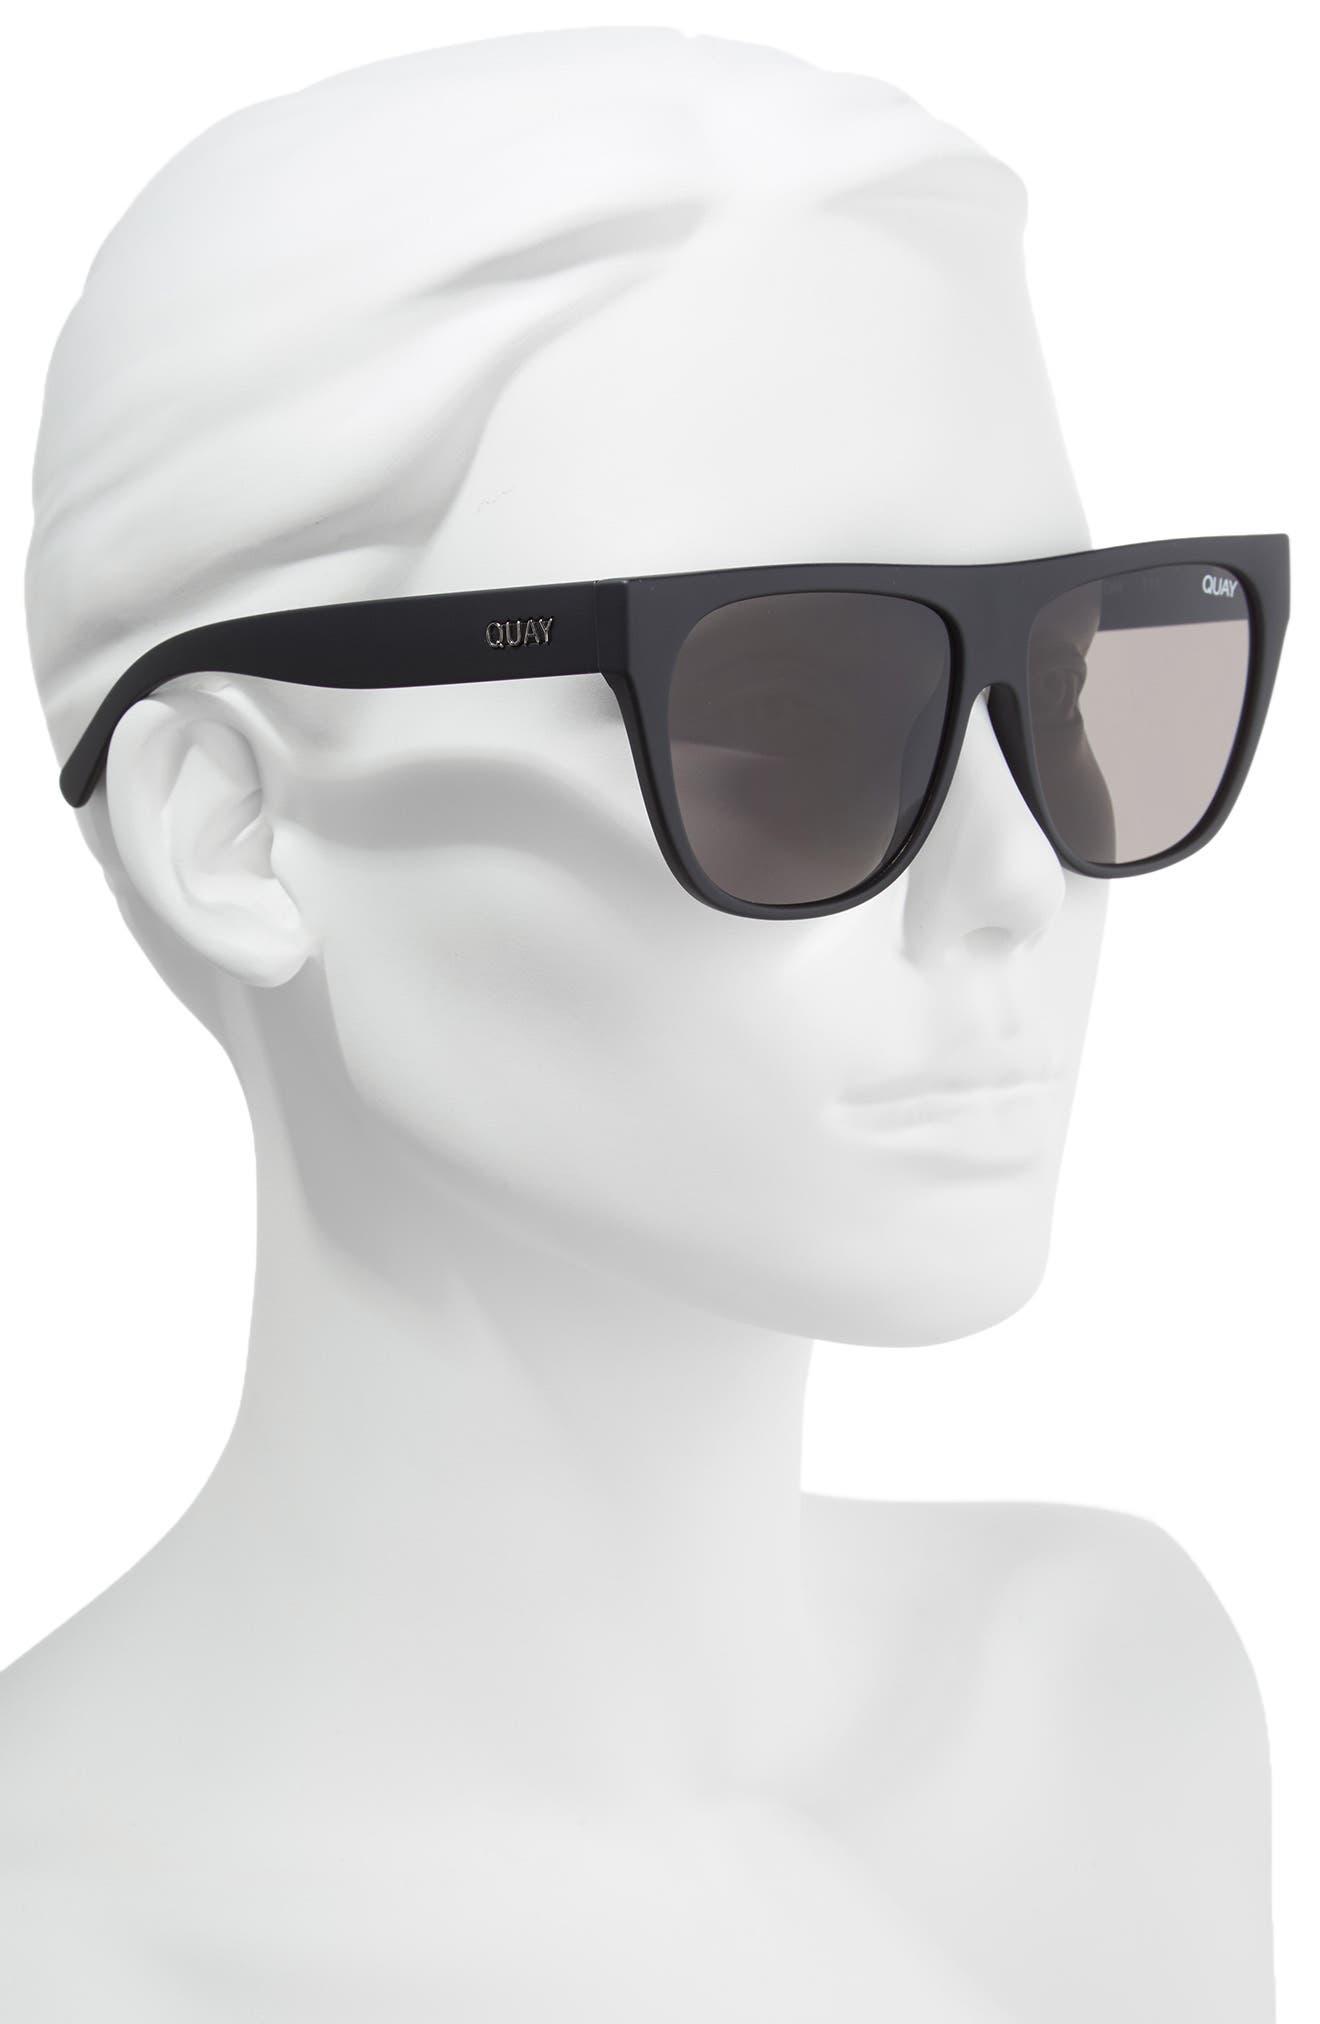 x Tony Bianco Drama by Day 55mm Square Sunglasses,                             Alternate thumbnail 2, color,                             Black/ Smoke